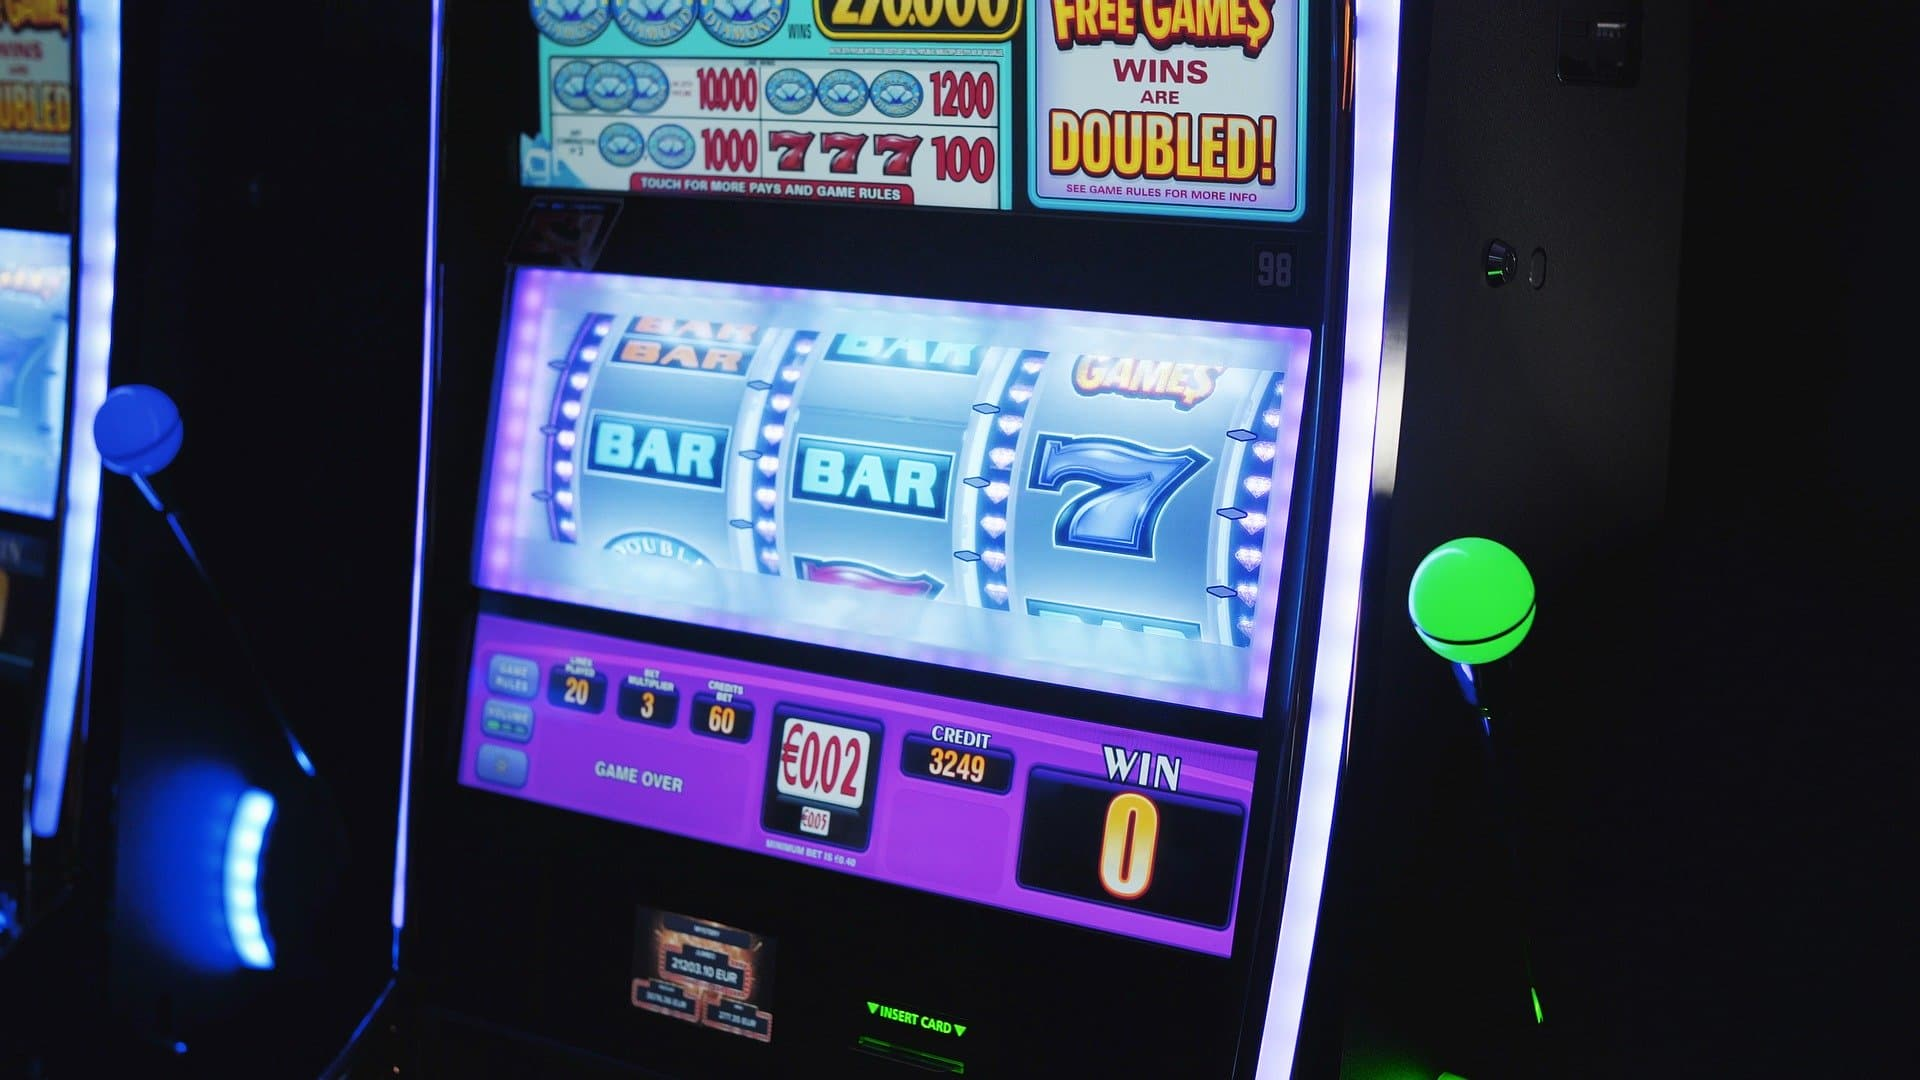 casinos in nz - Our Other Favorite Casinos in NZ